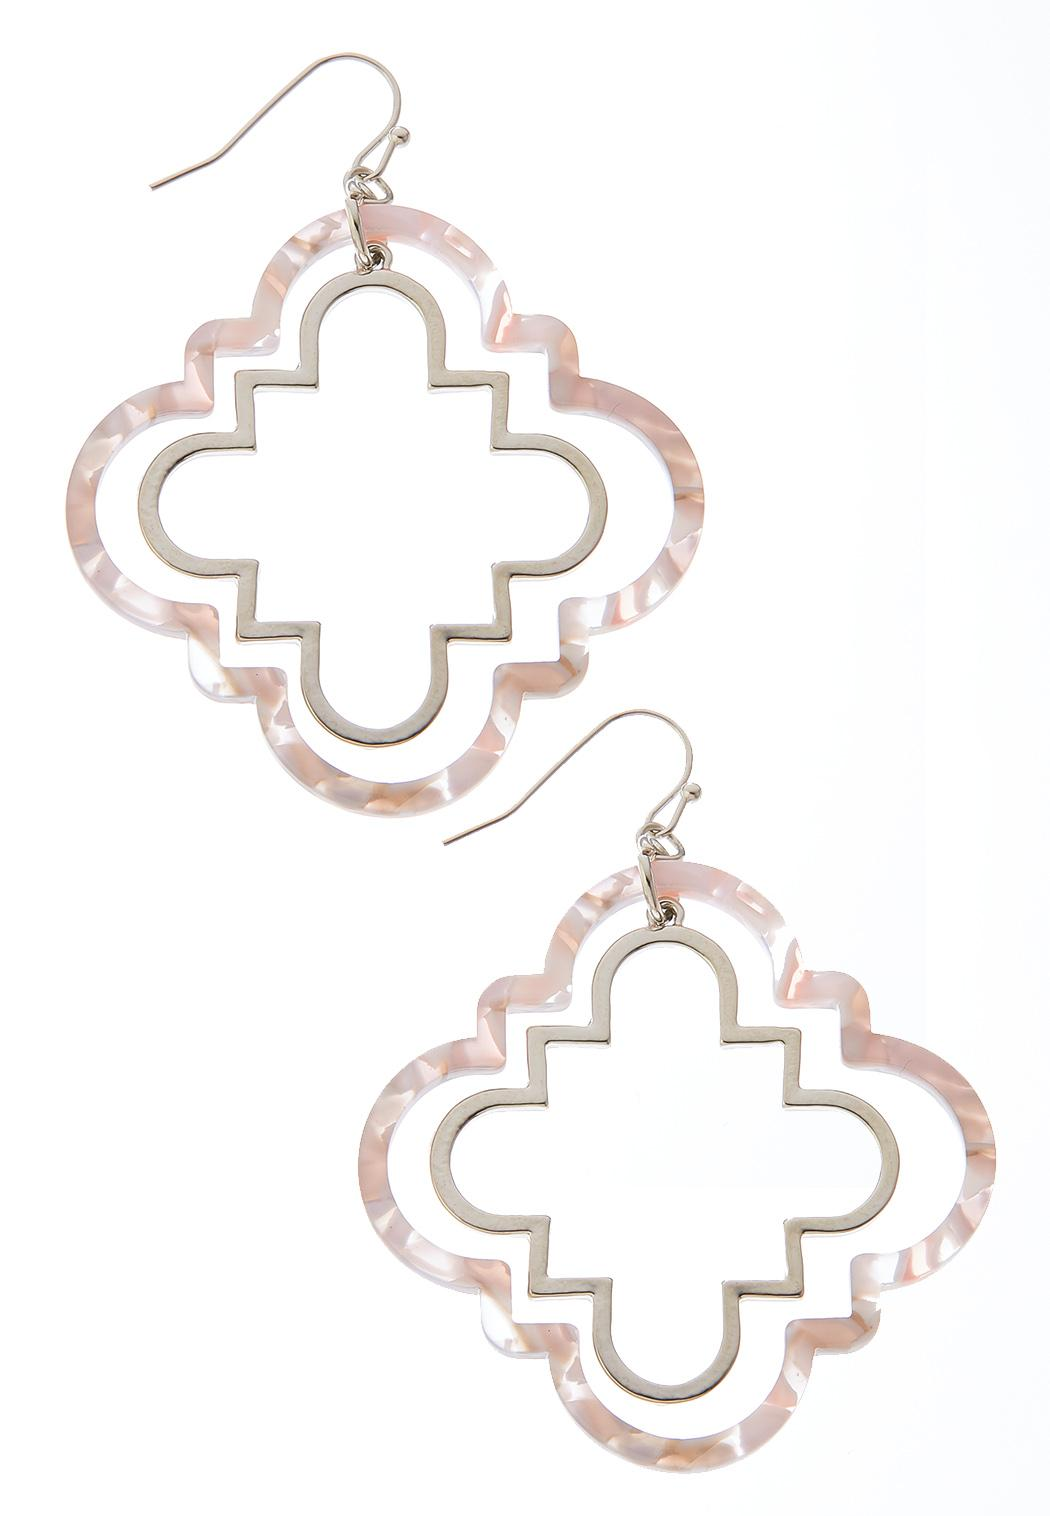 Cutout Clover Marbleized Earrings